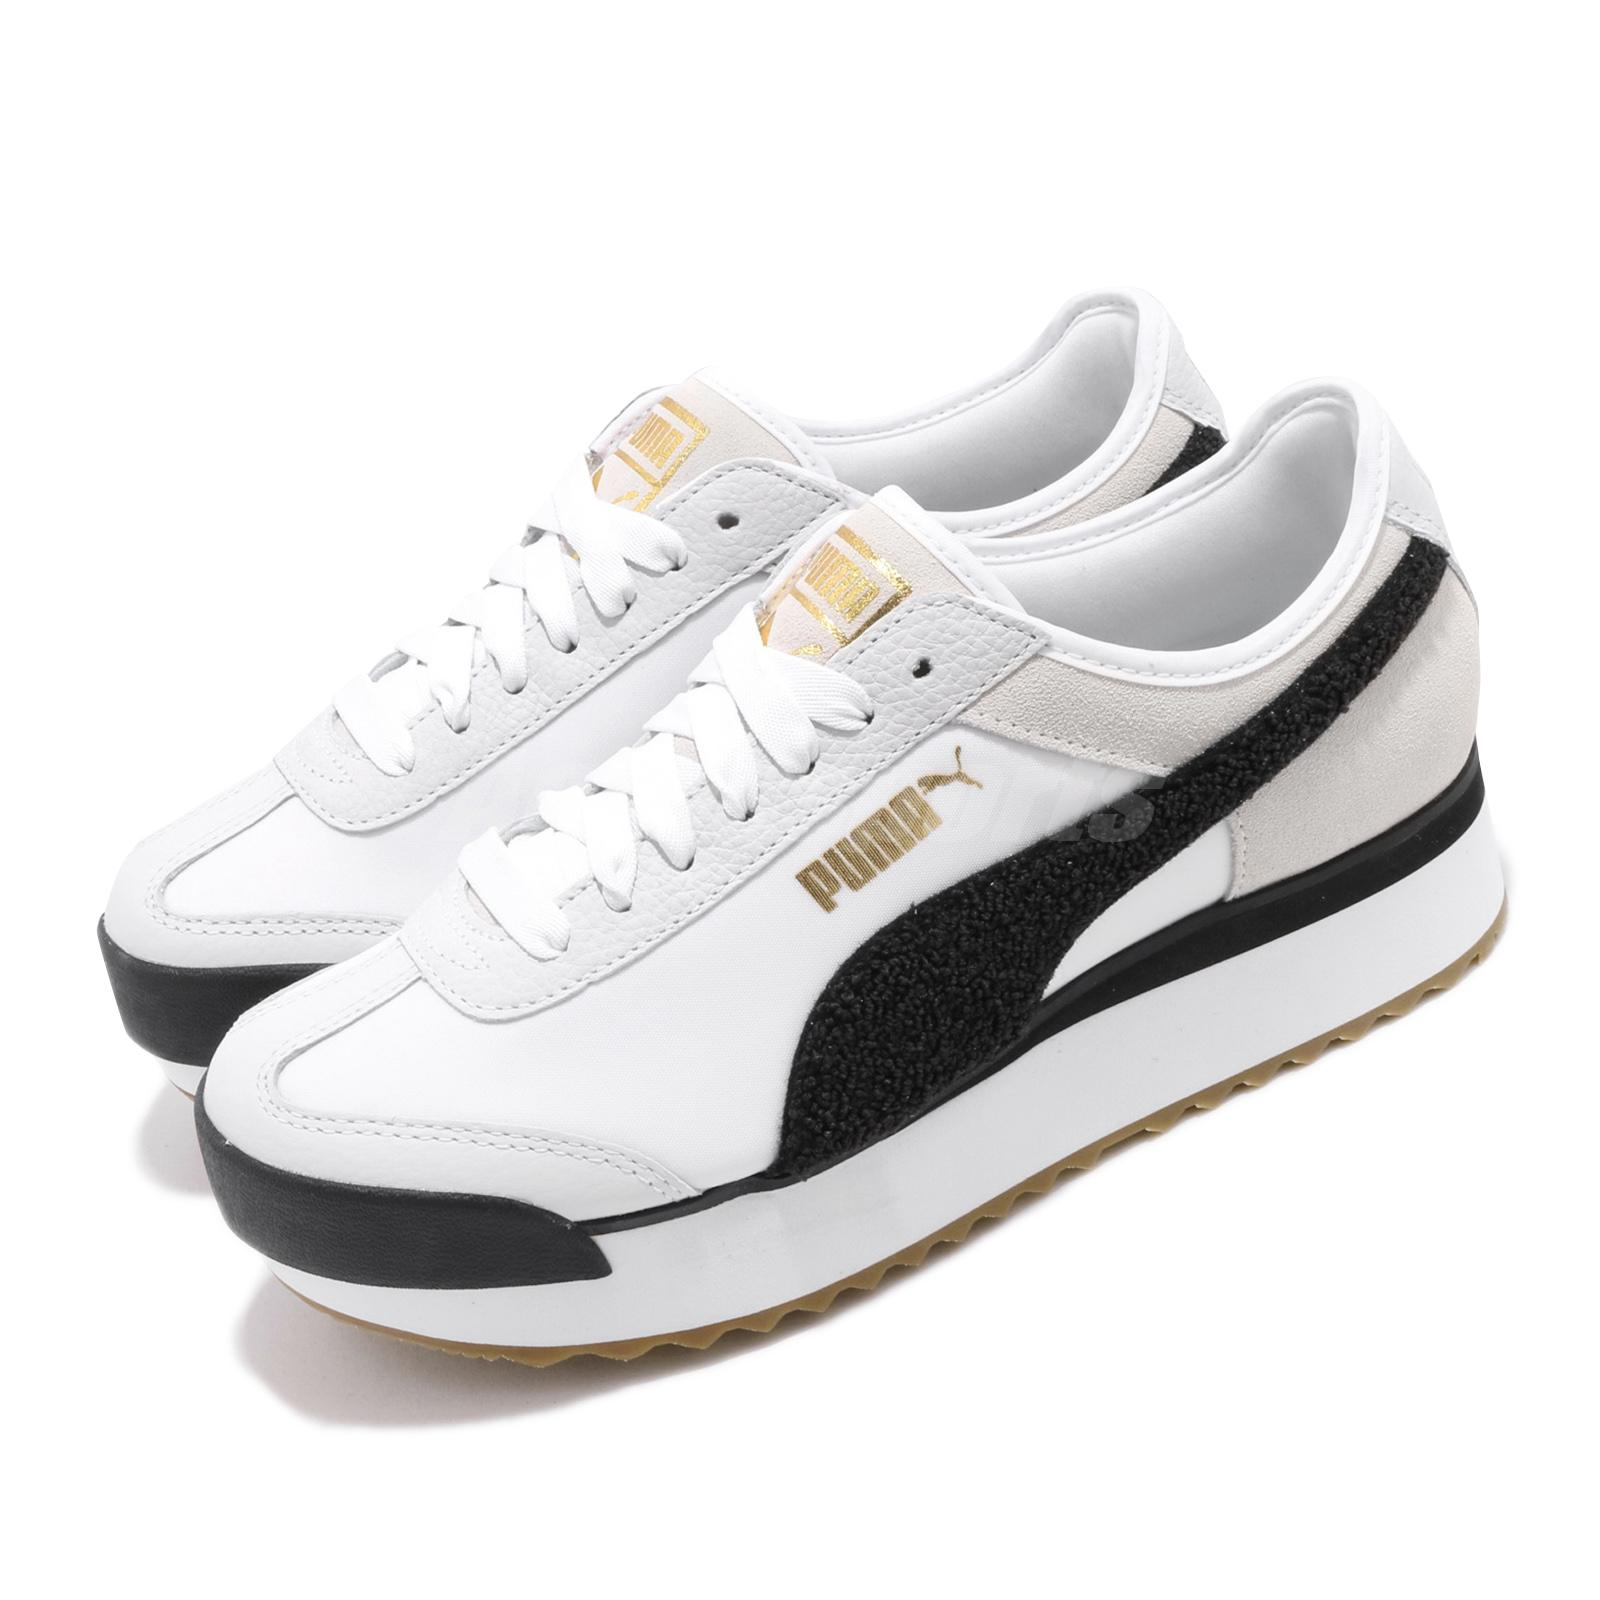 Details about Puma Roma Amor Heritage Wns White Black Gum Women Casual  Platform Shoe 370947-01